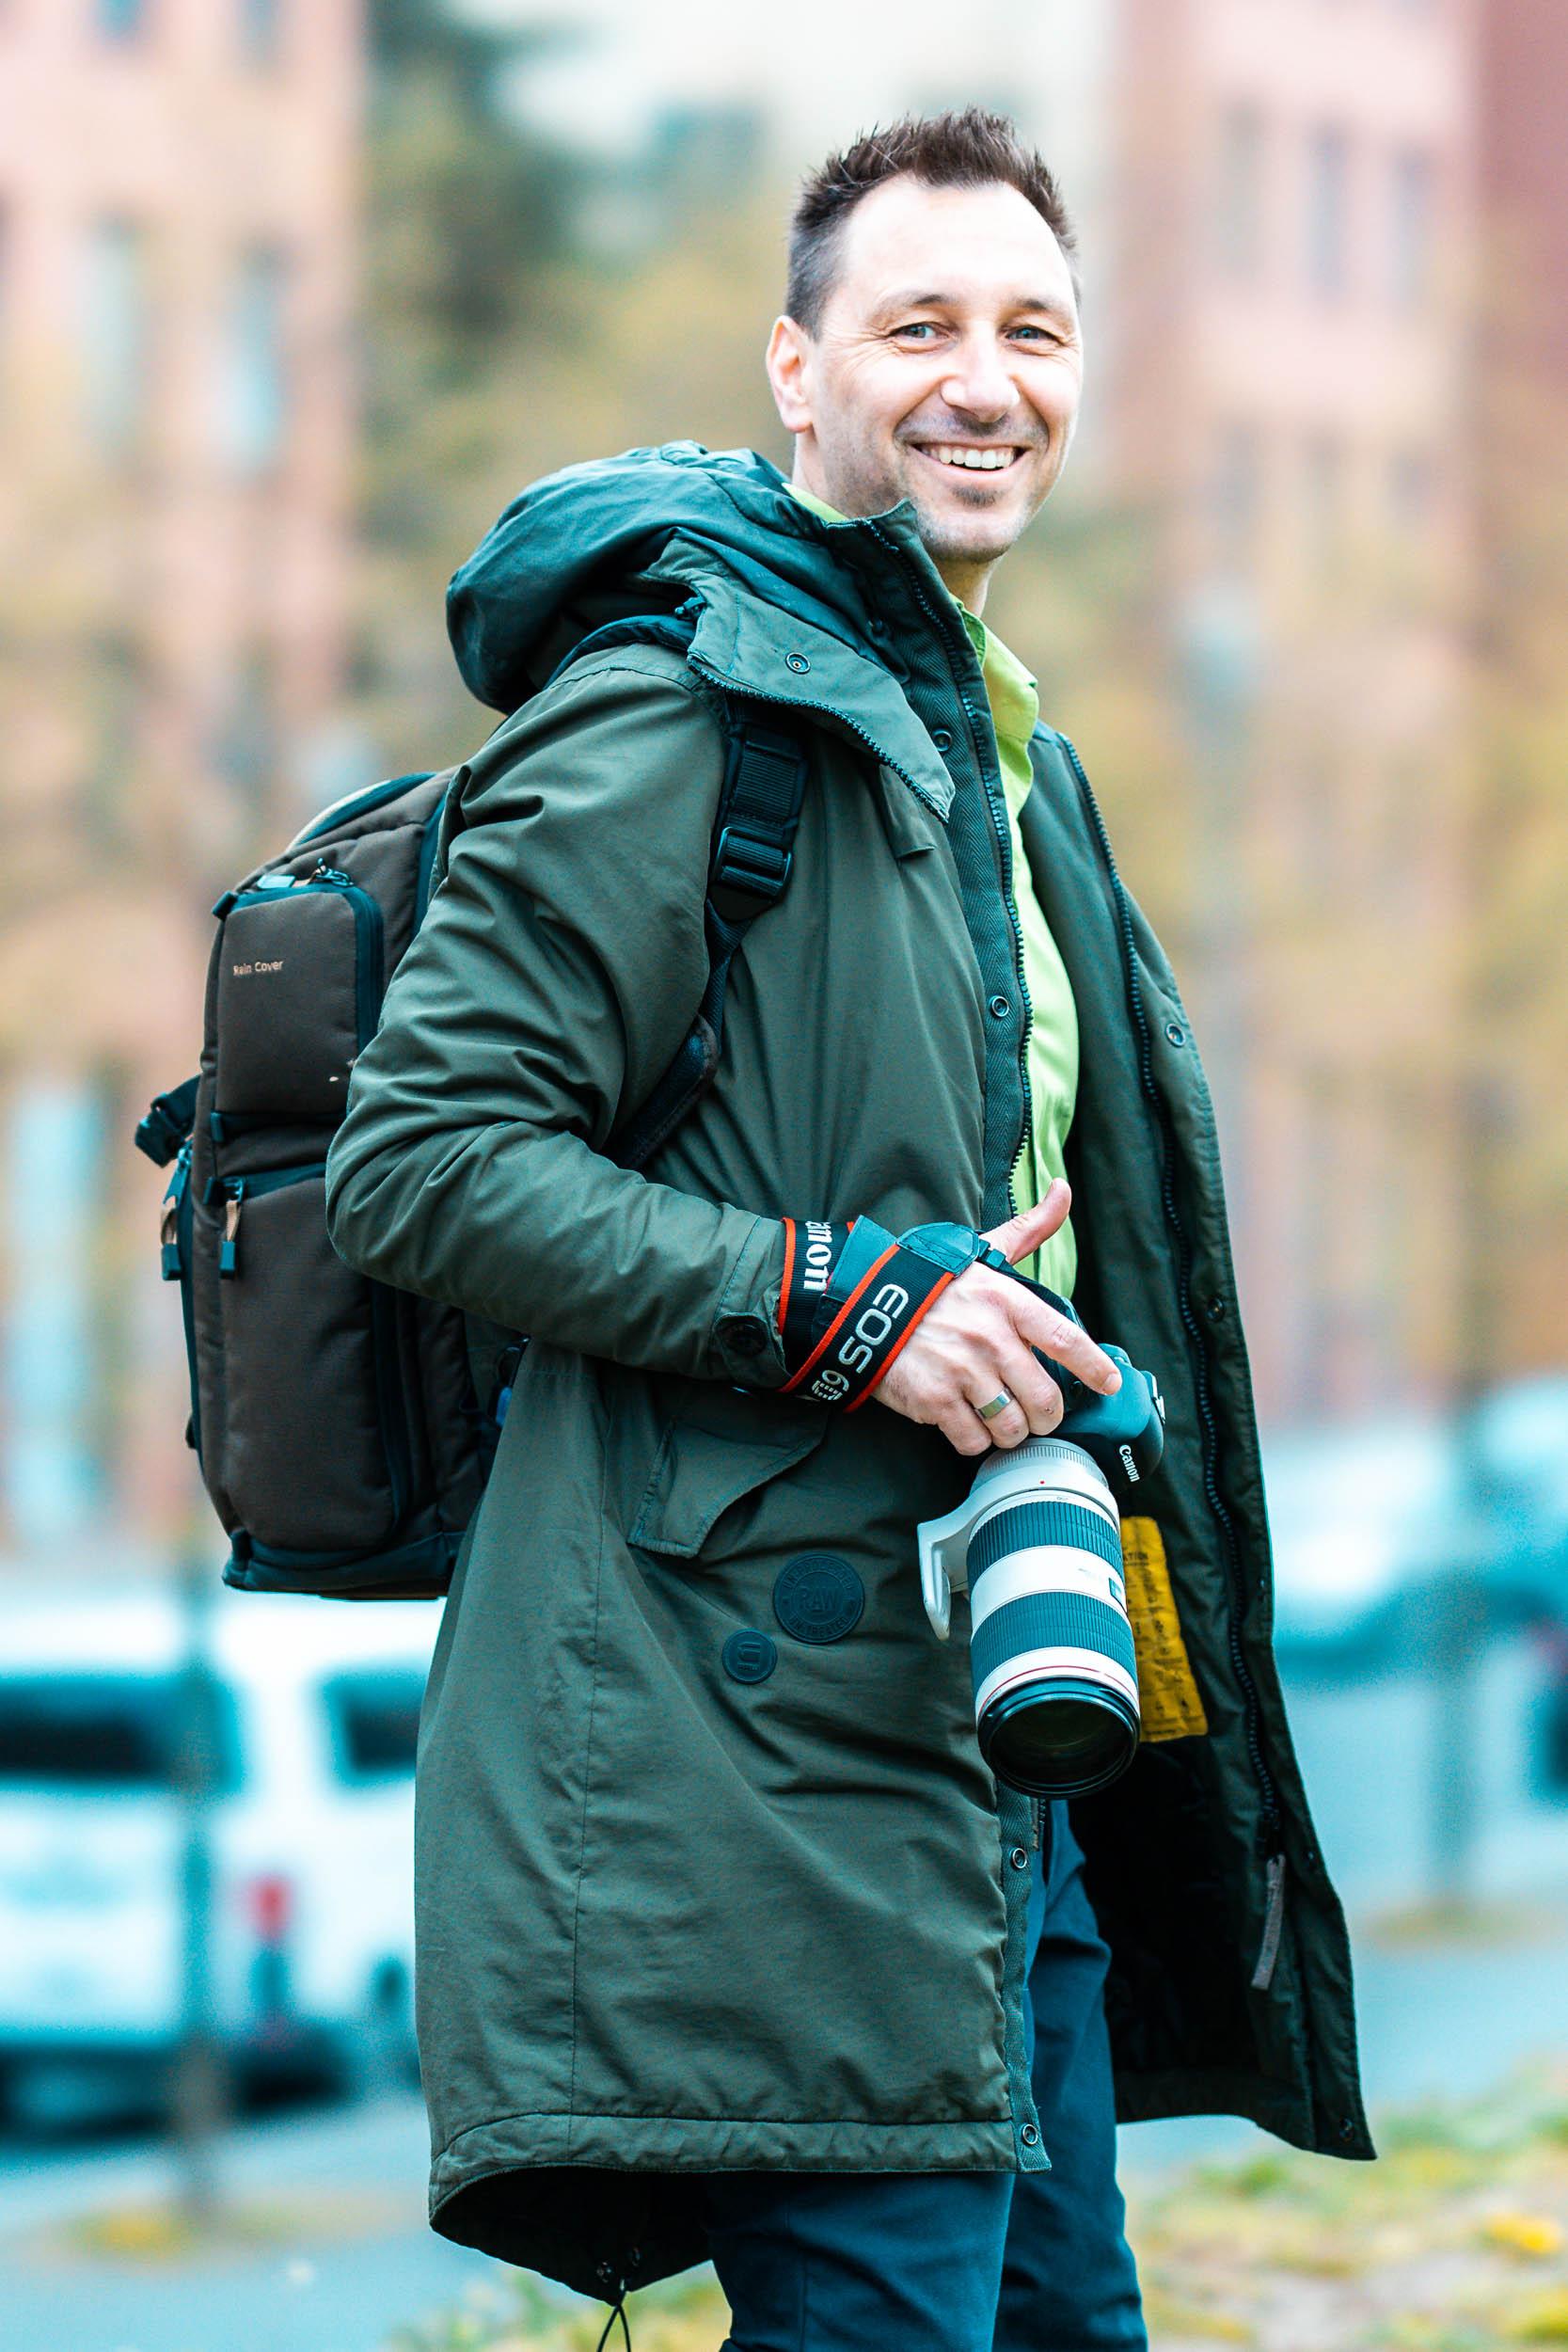 Personal Branding Fototografie Ronny Wunderlich